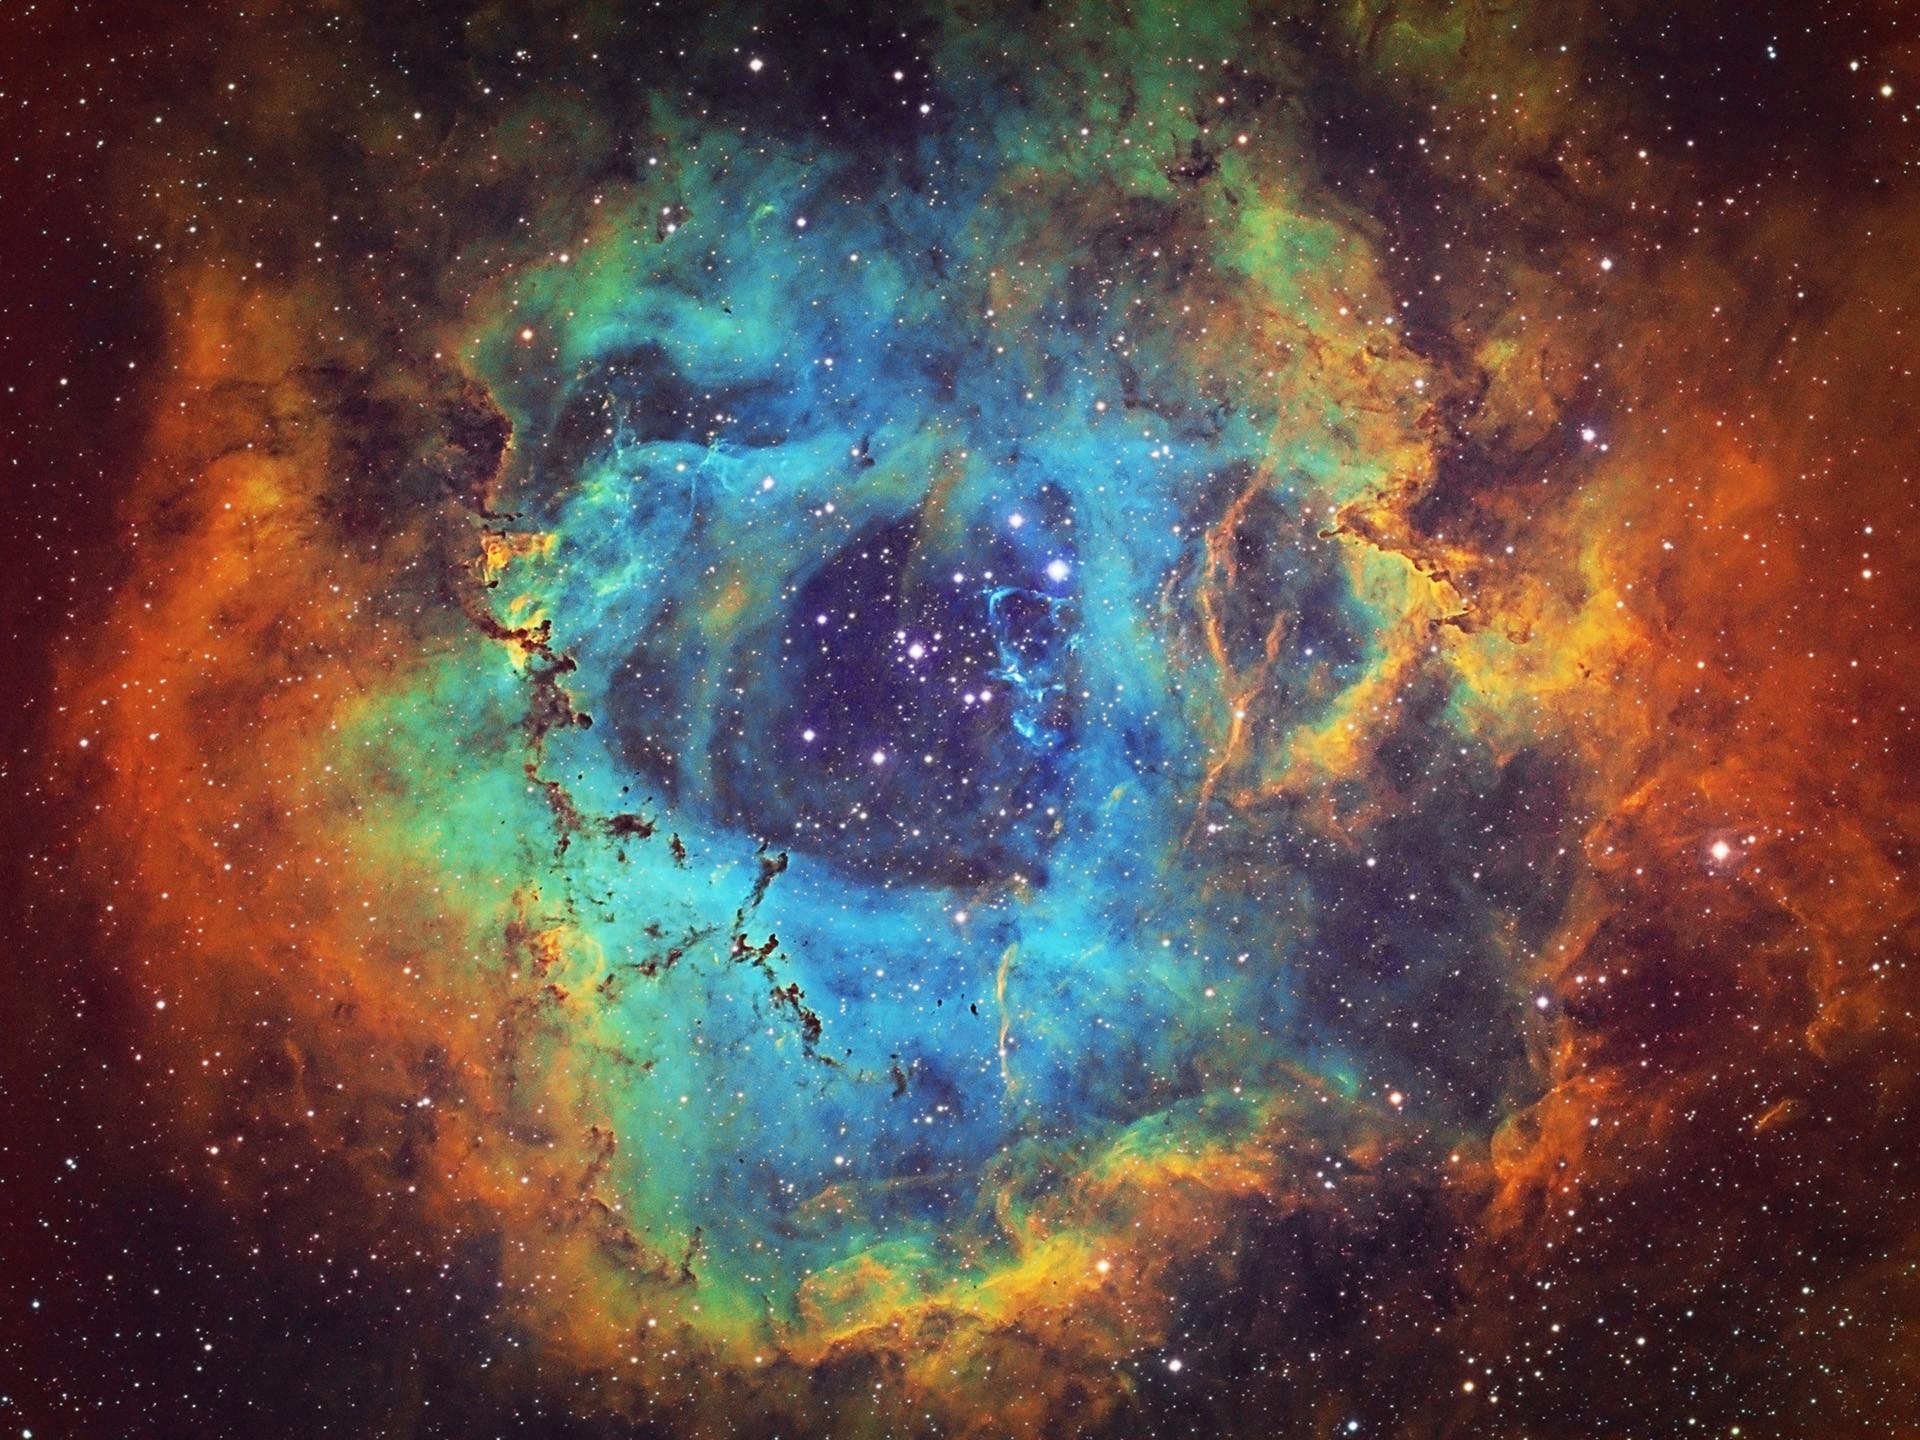 !Final_NGC2246-HST_v3_lesscolor_lesshalo_FA_1920px.jpg